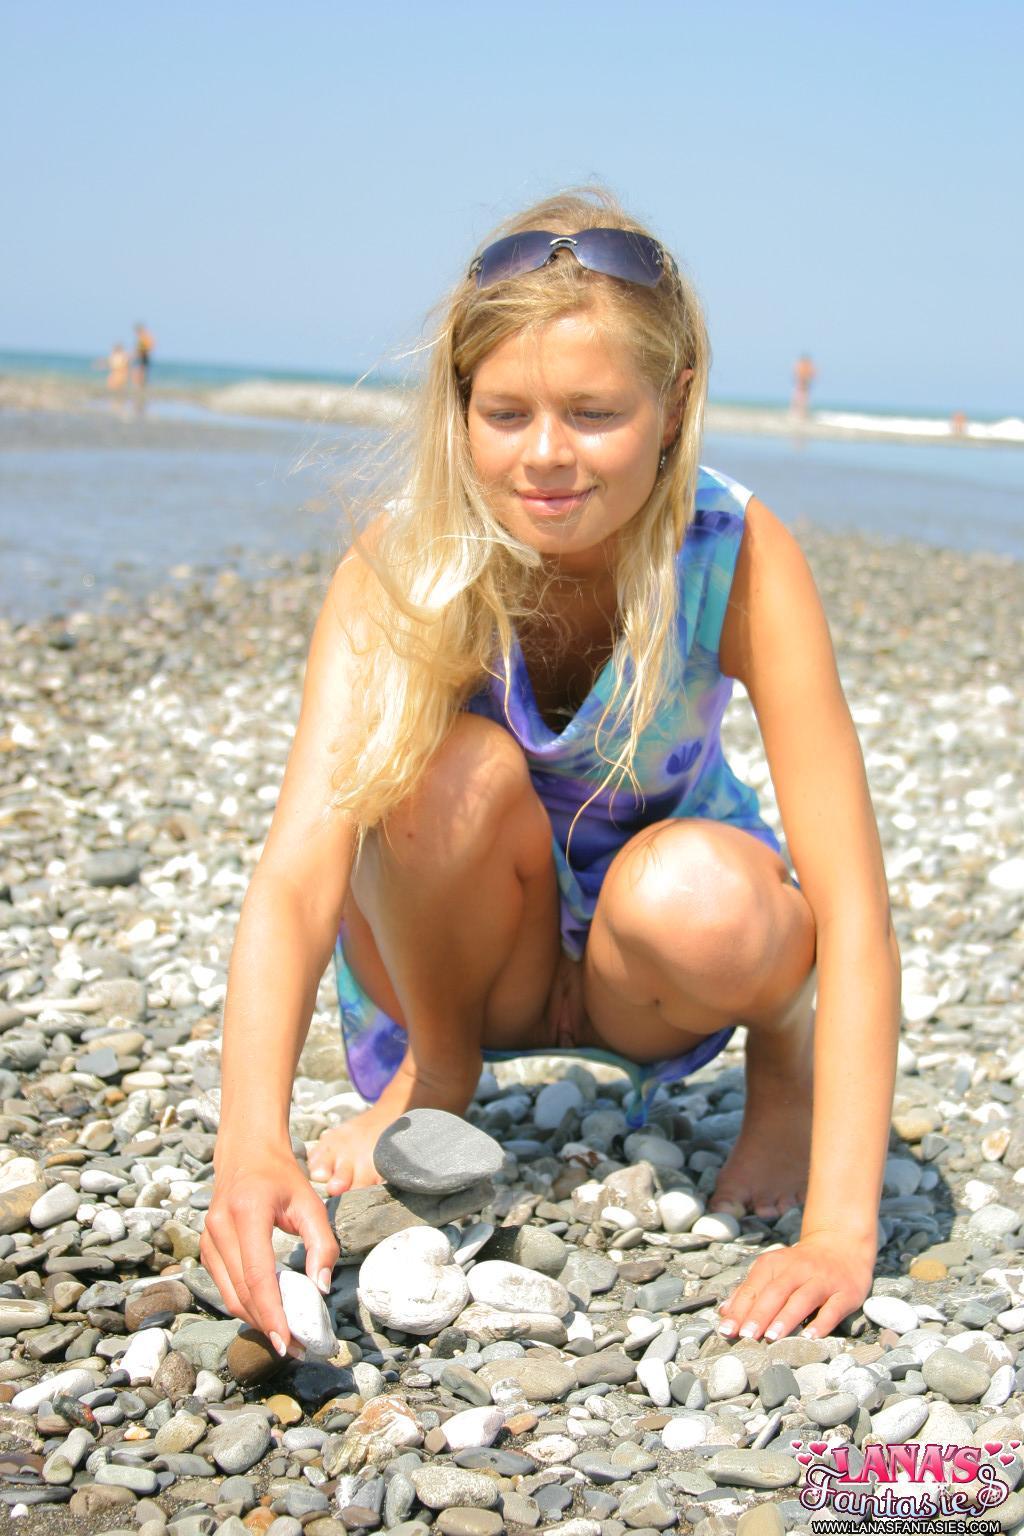 Фото девушек на пляже без белья фото 129-223